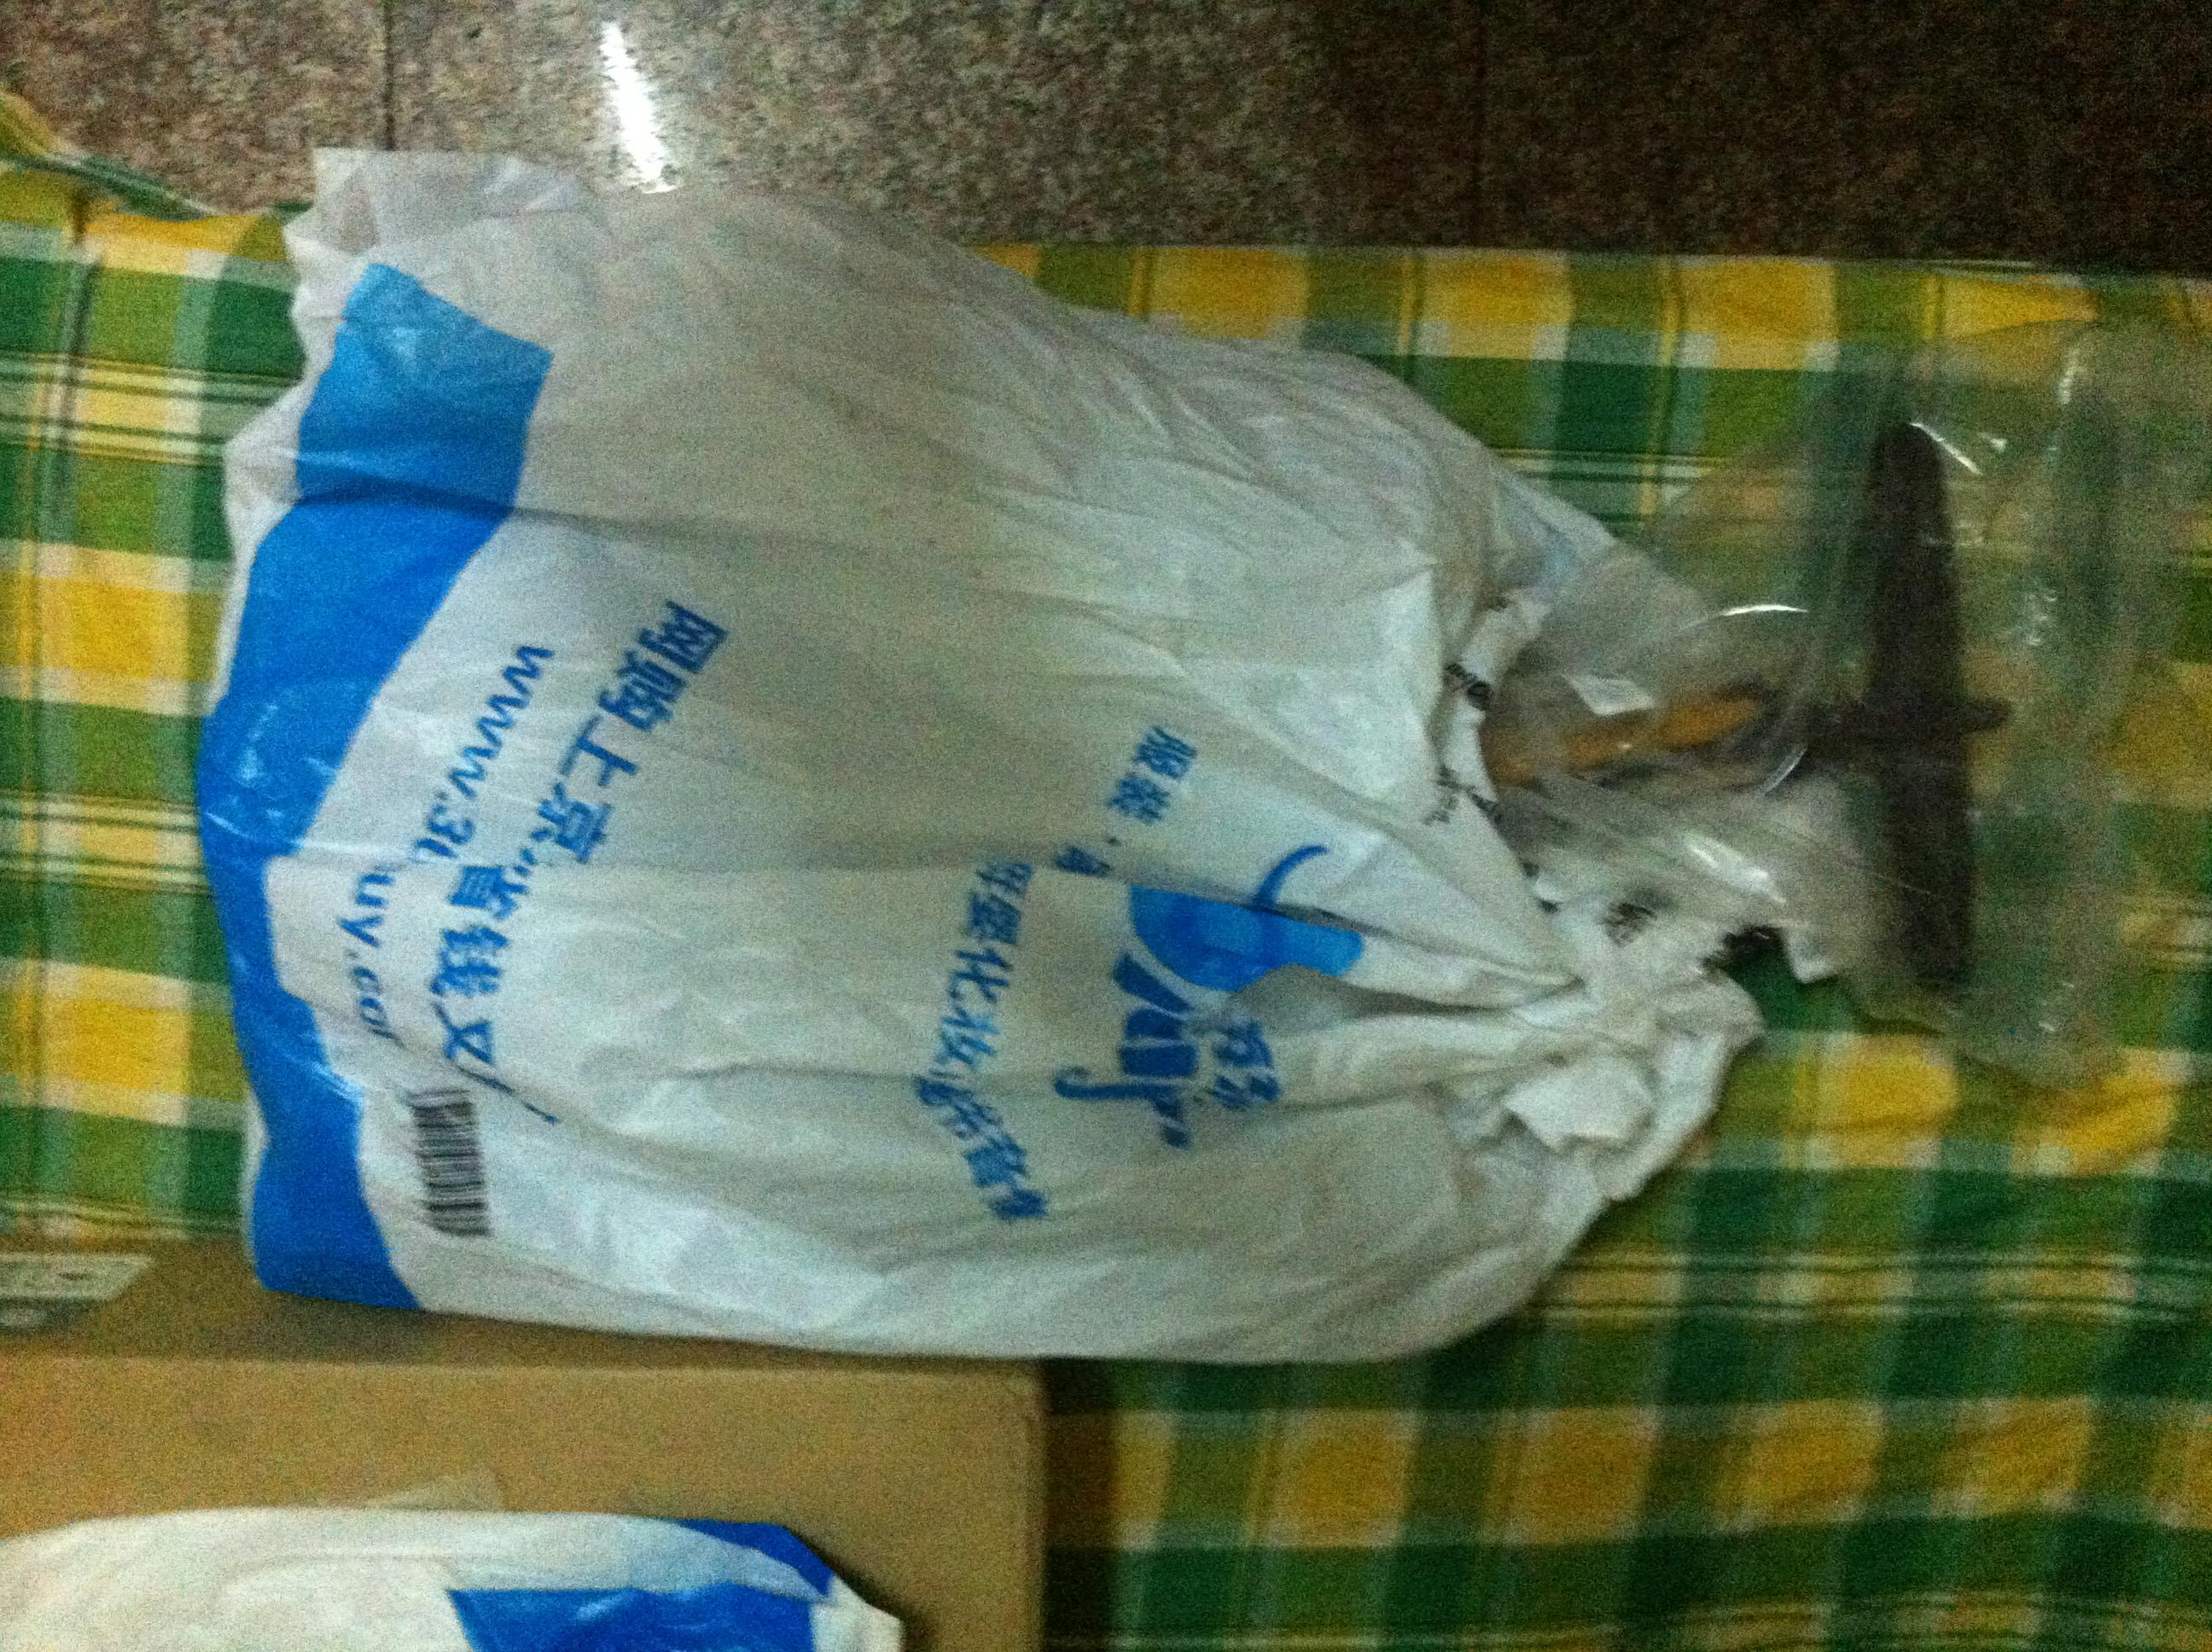 nike factory store online uk map 00296241 bags